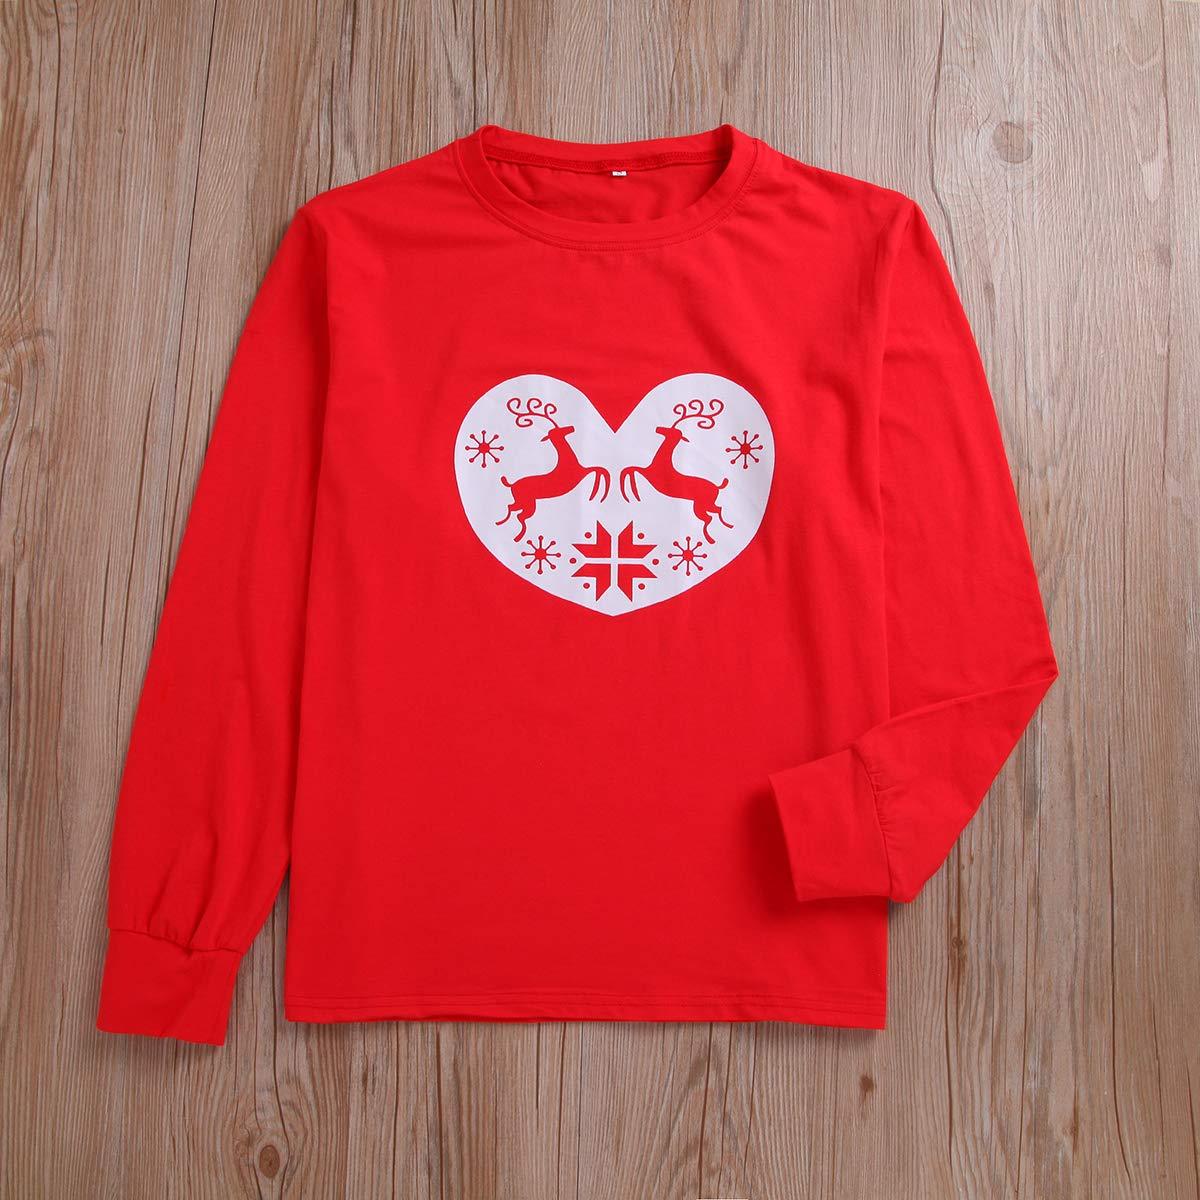 Family Christmas Pajamas Set Adult Kids Girls Boy Mommy Dad Sleepwear 2pcs